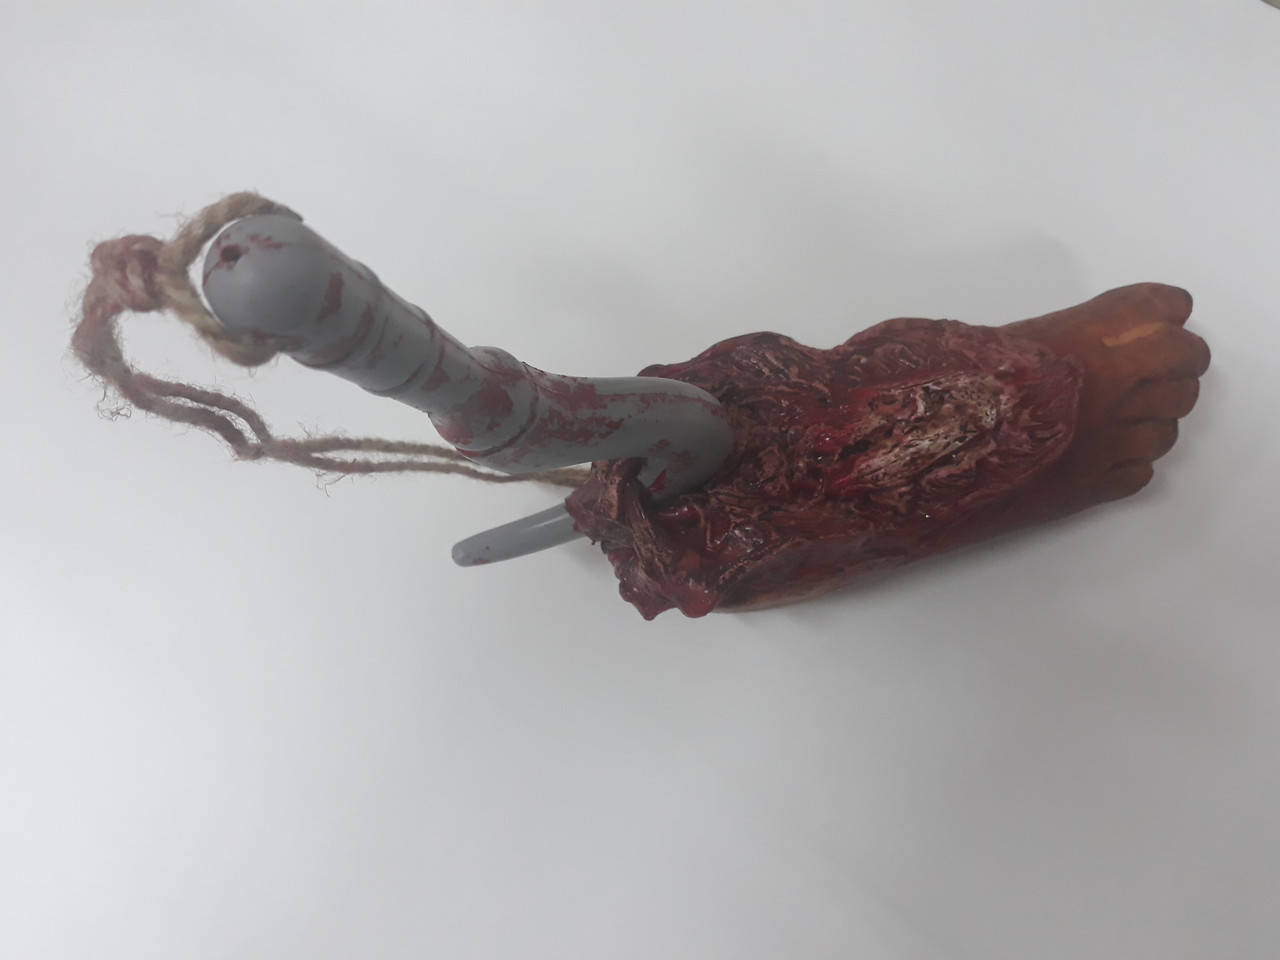 Кровавая нога на крюке для Хэллоуина